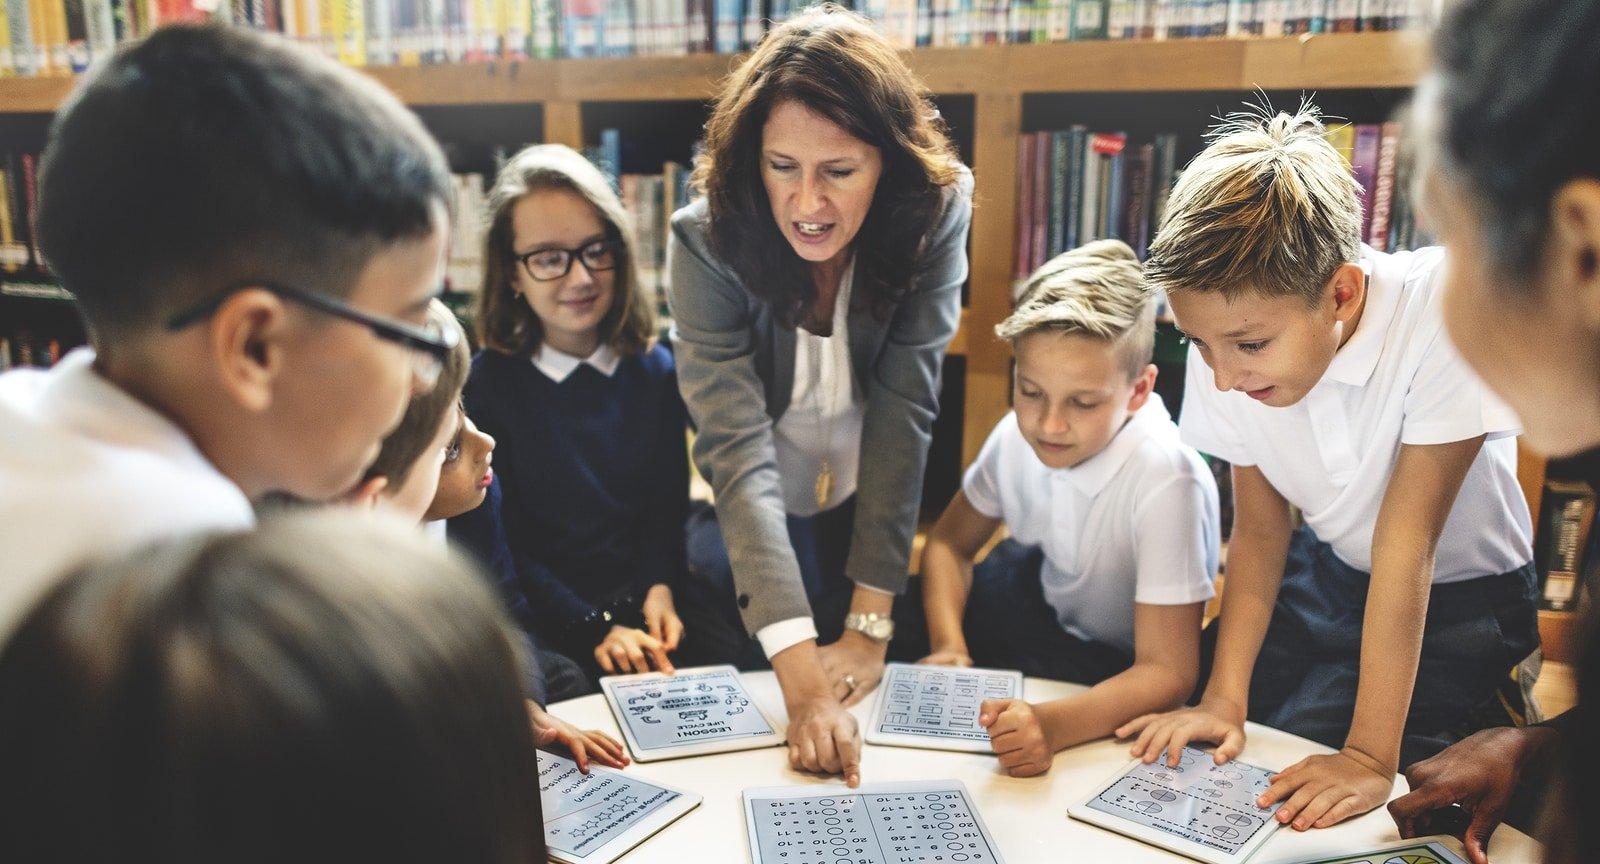 lesson plans | lesson planning | classroom management | student behavior | how to plan a lesson